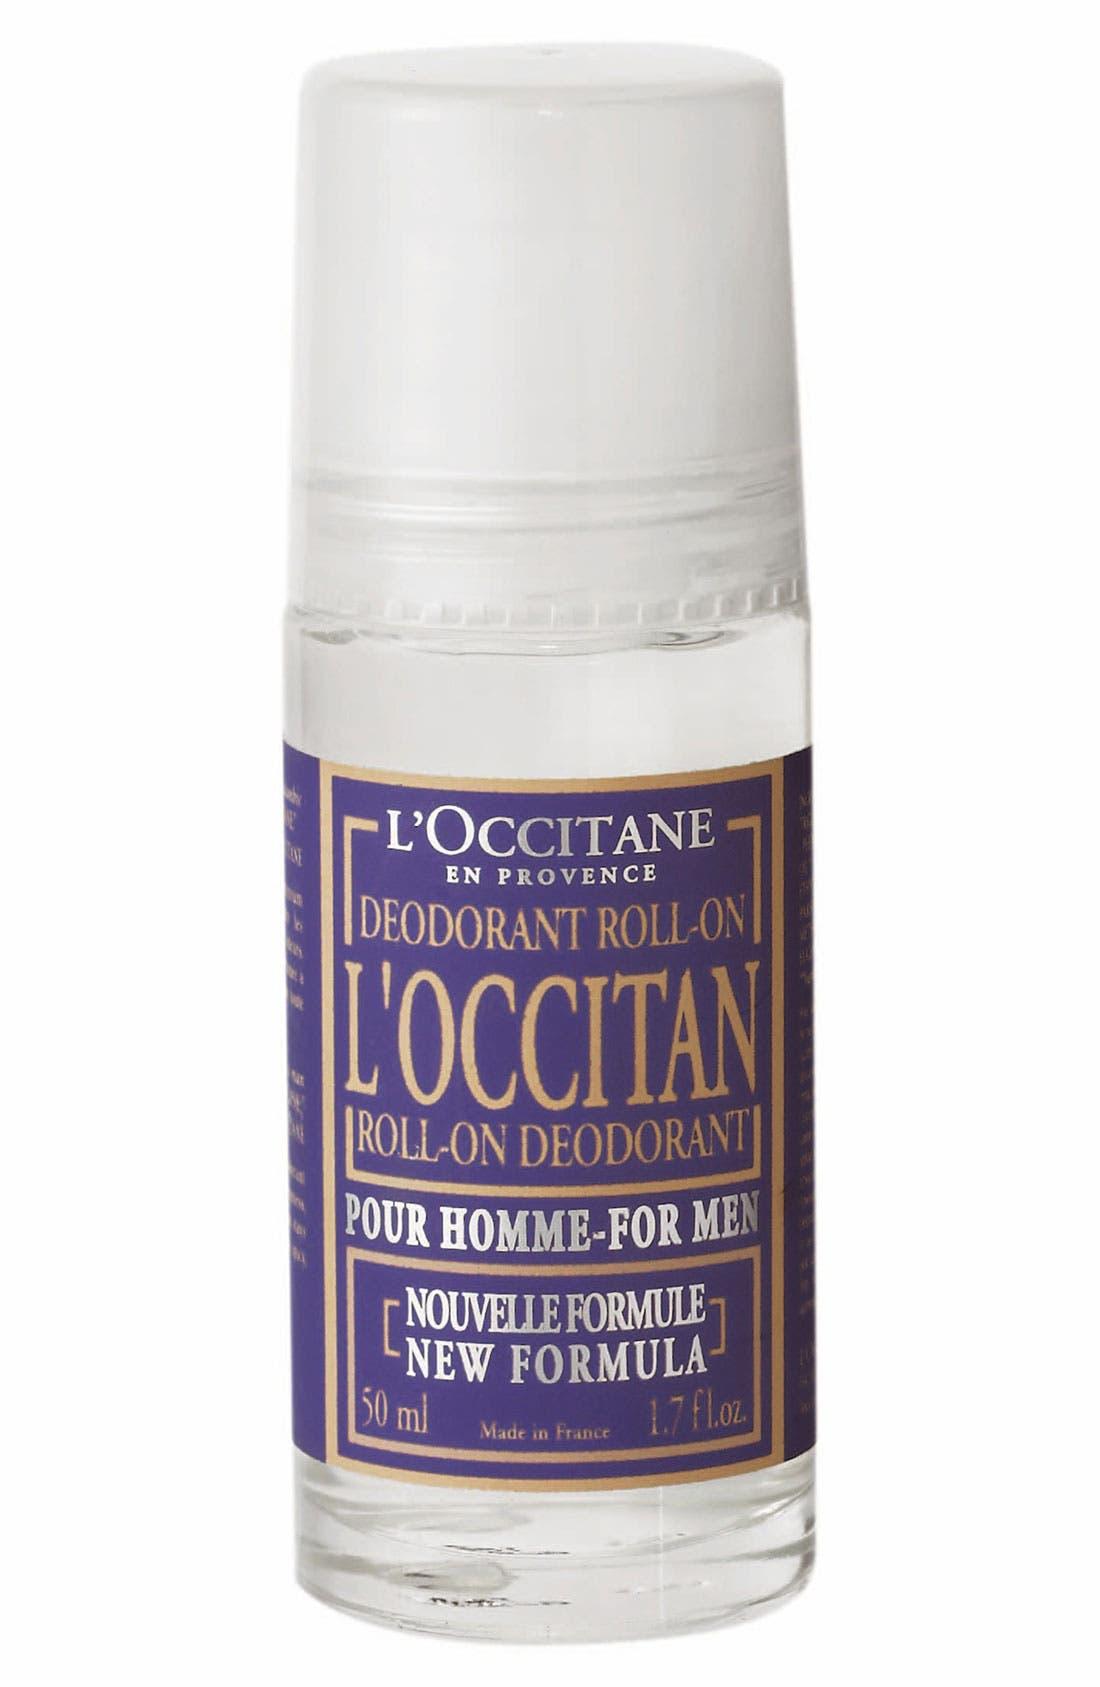 'L'Occitan' Roll-On Deodorant,                             Main thumbnail 1, color,                             000